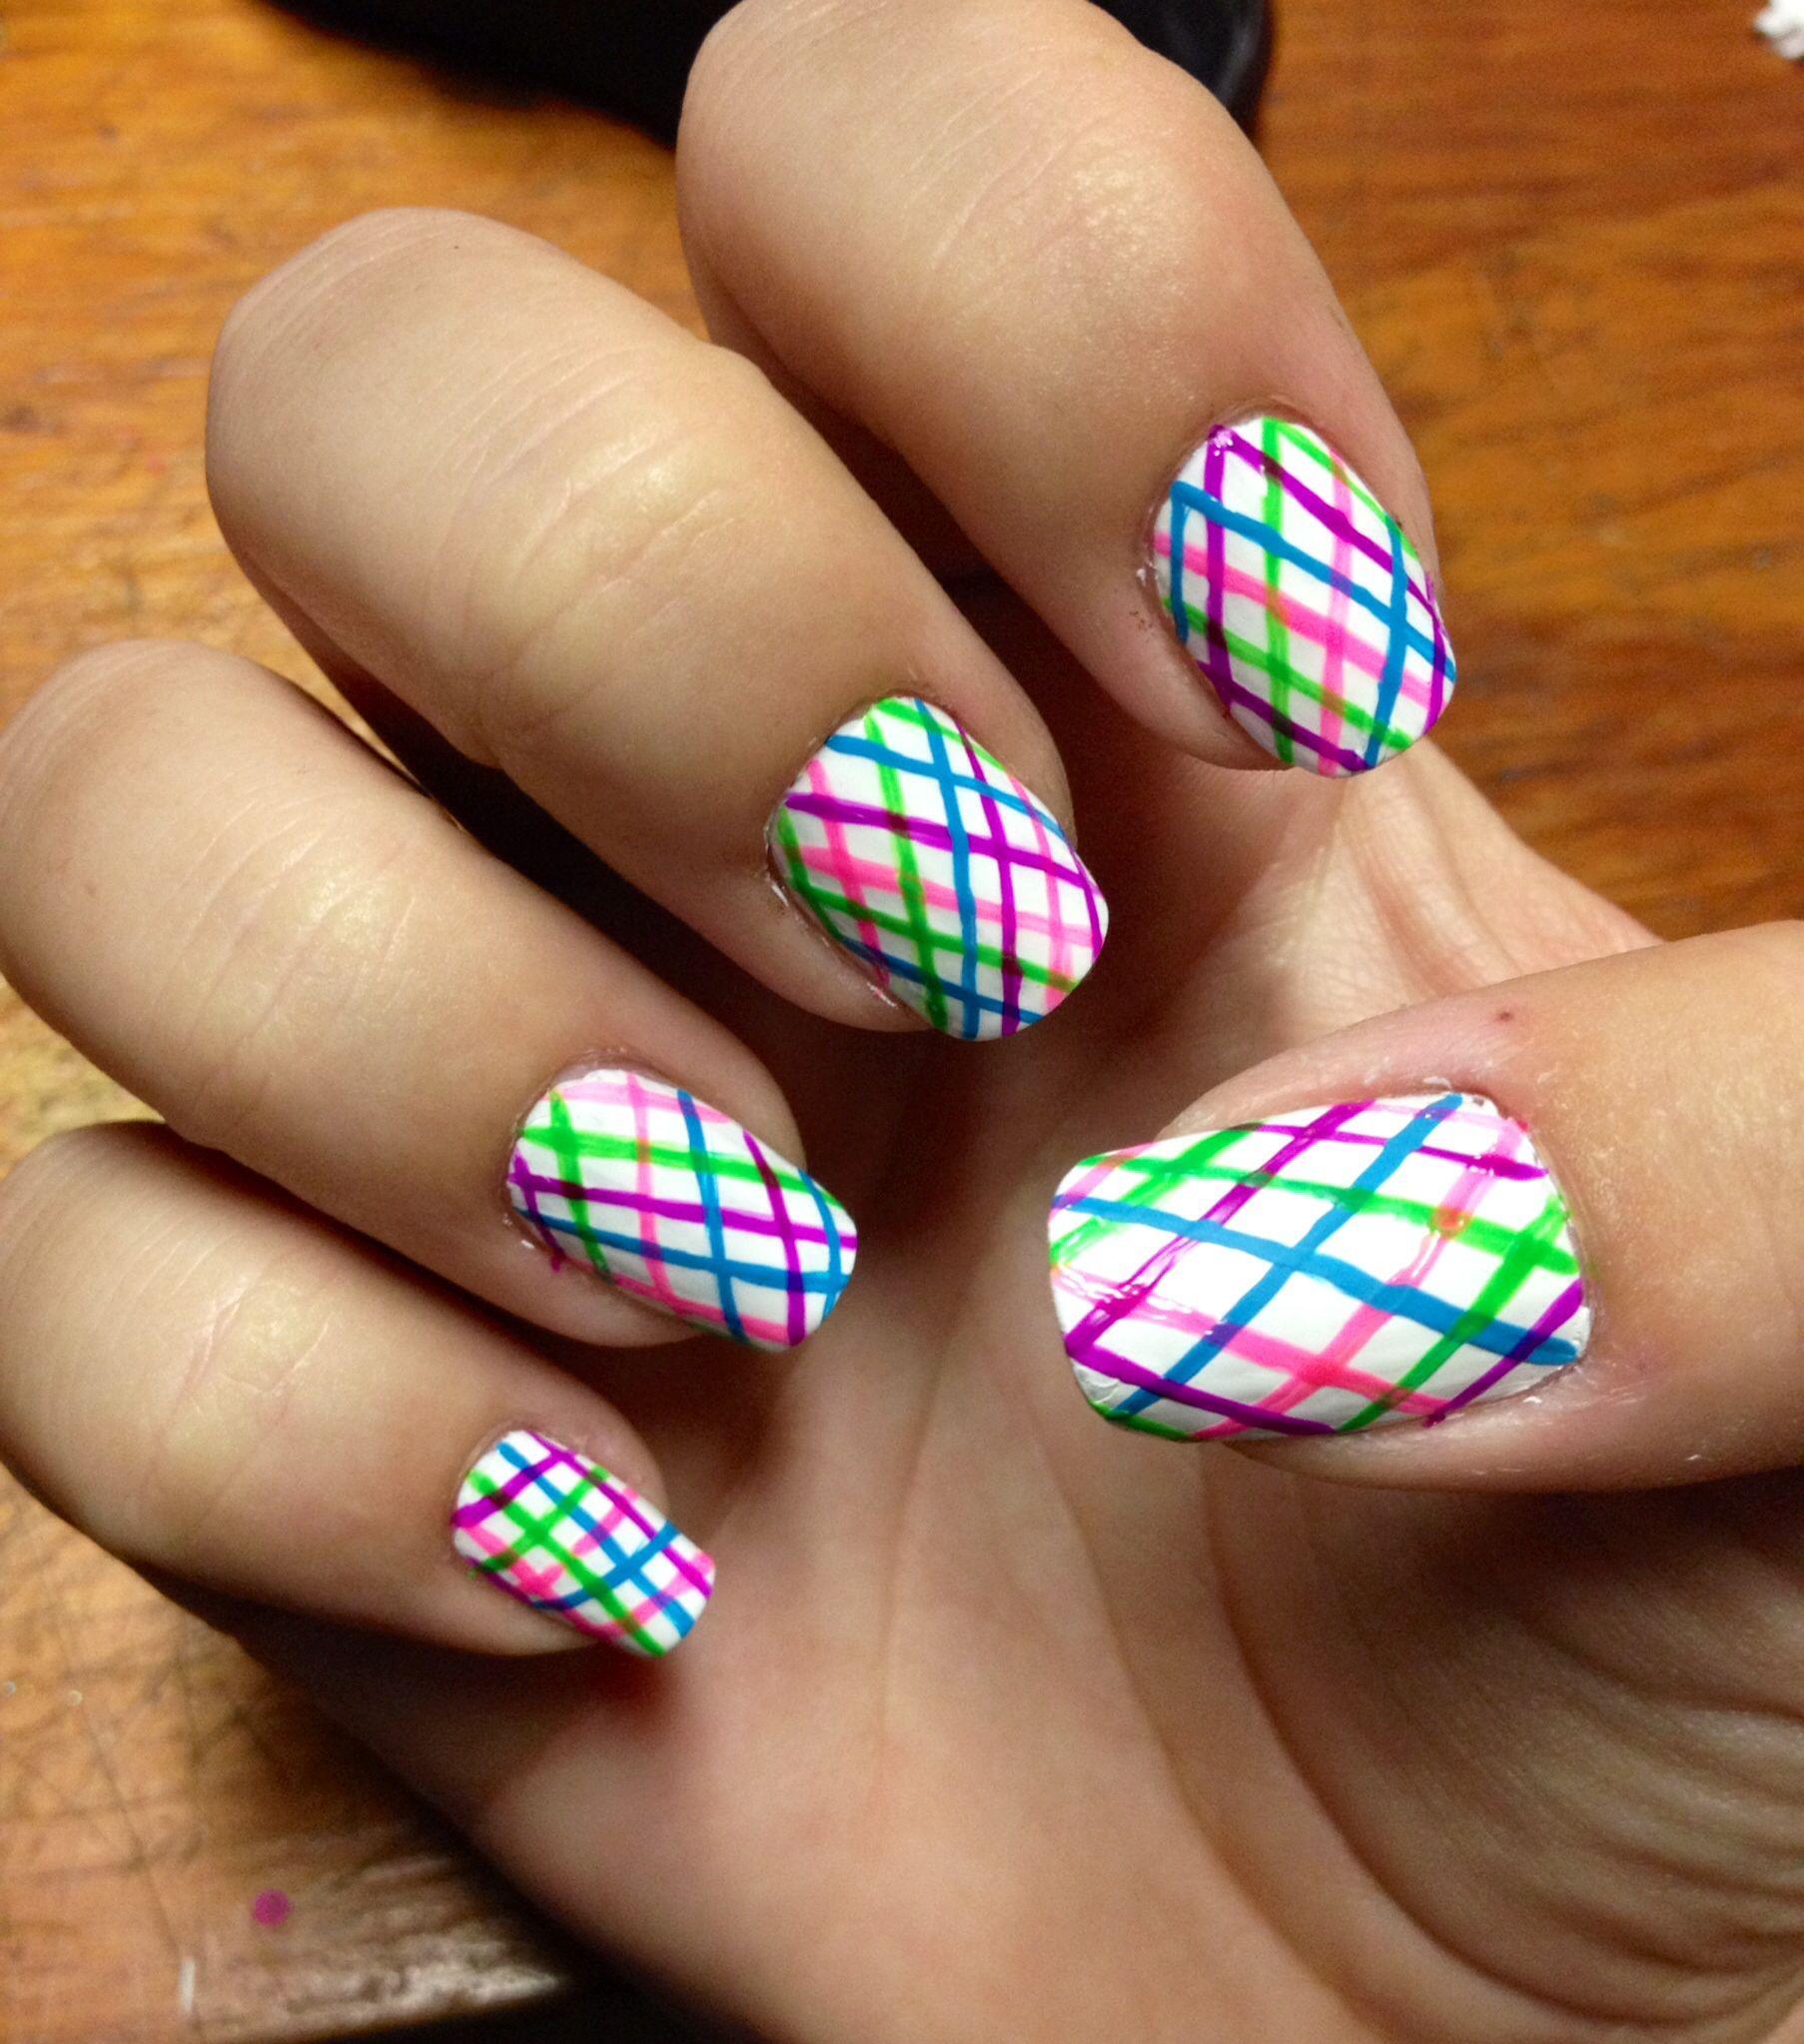 White Background With Rainbow Stripes Plaid Design Crisscross